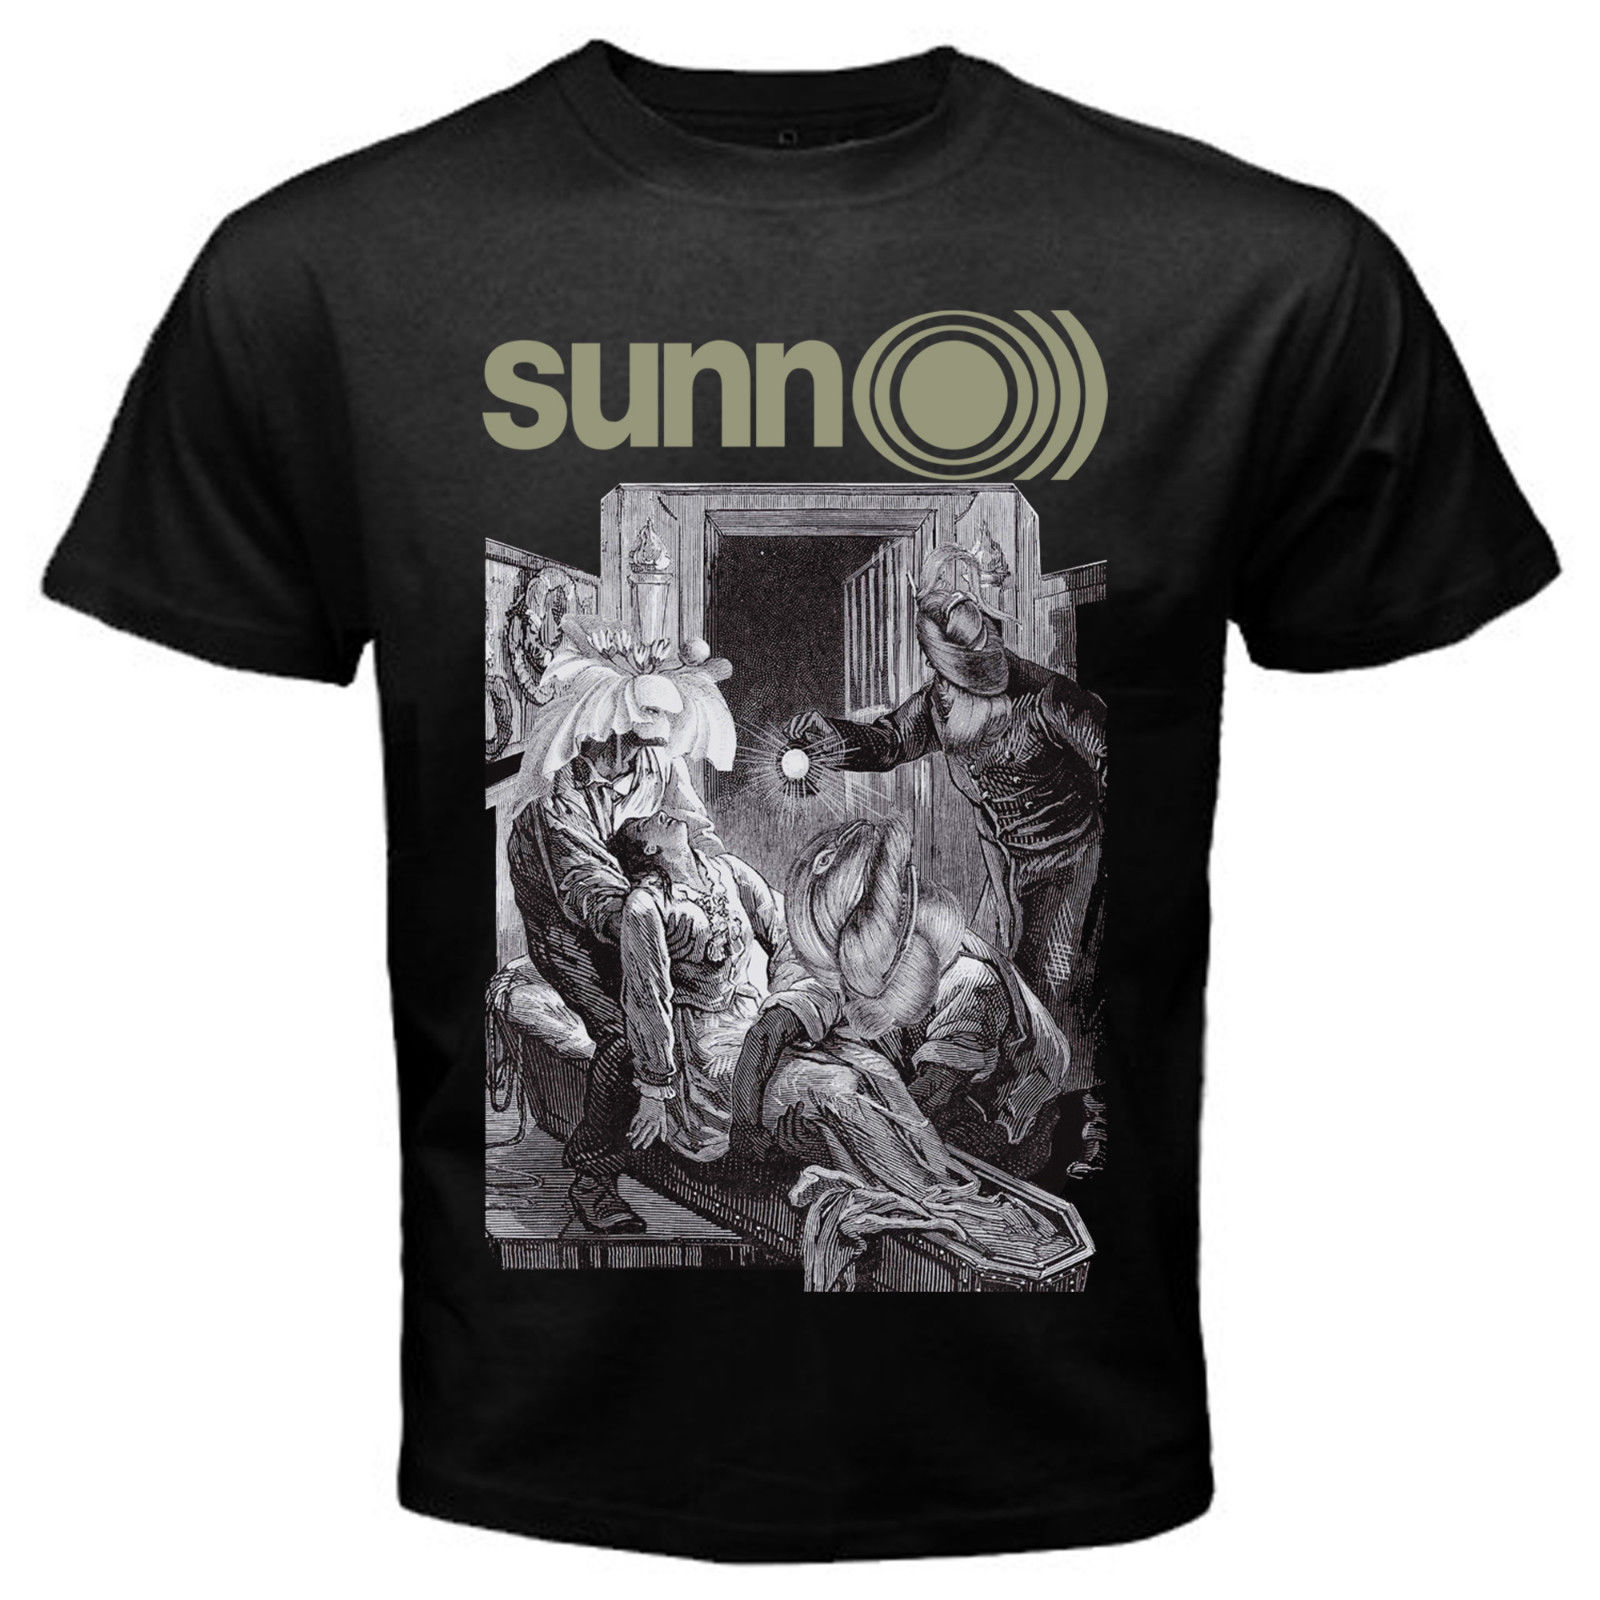 SUNN O))) T SHIRT METAL BAND Ava Size S / M / L / XL / XXL NEW SHIRT BORIS ULVER ...